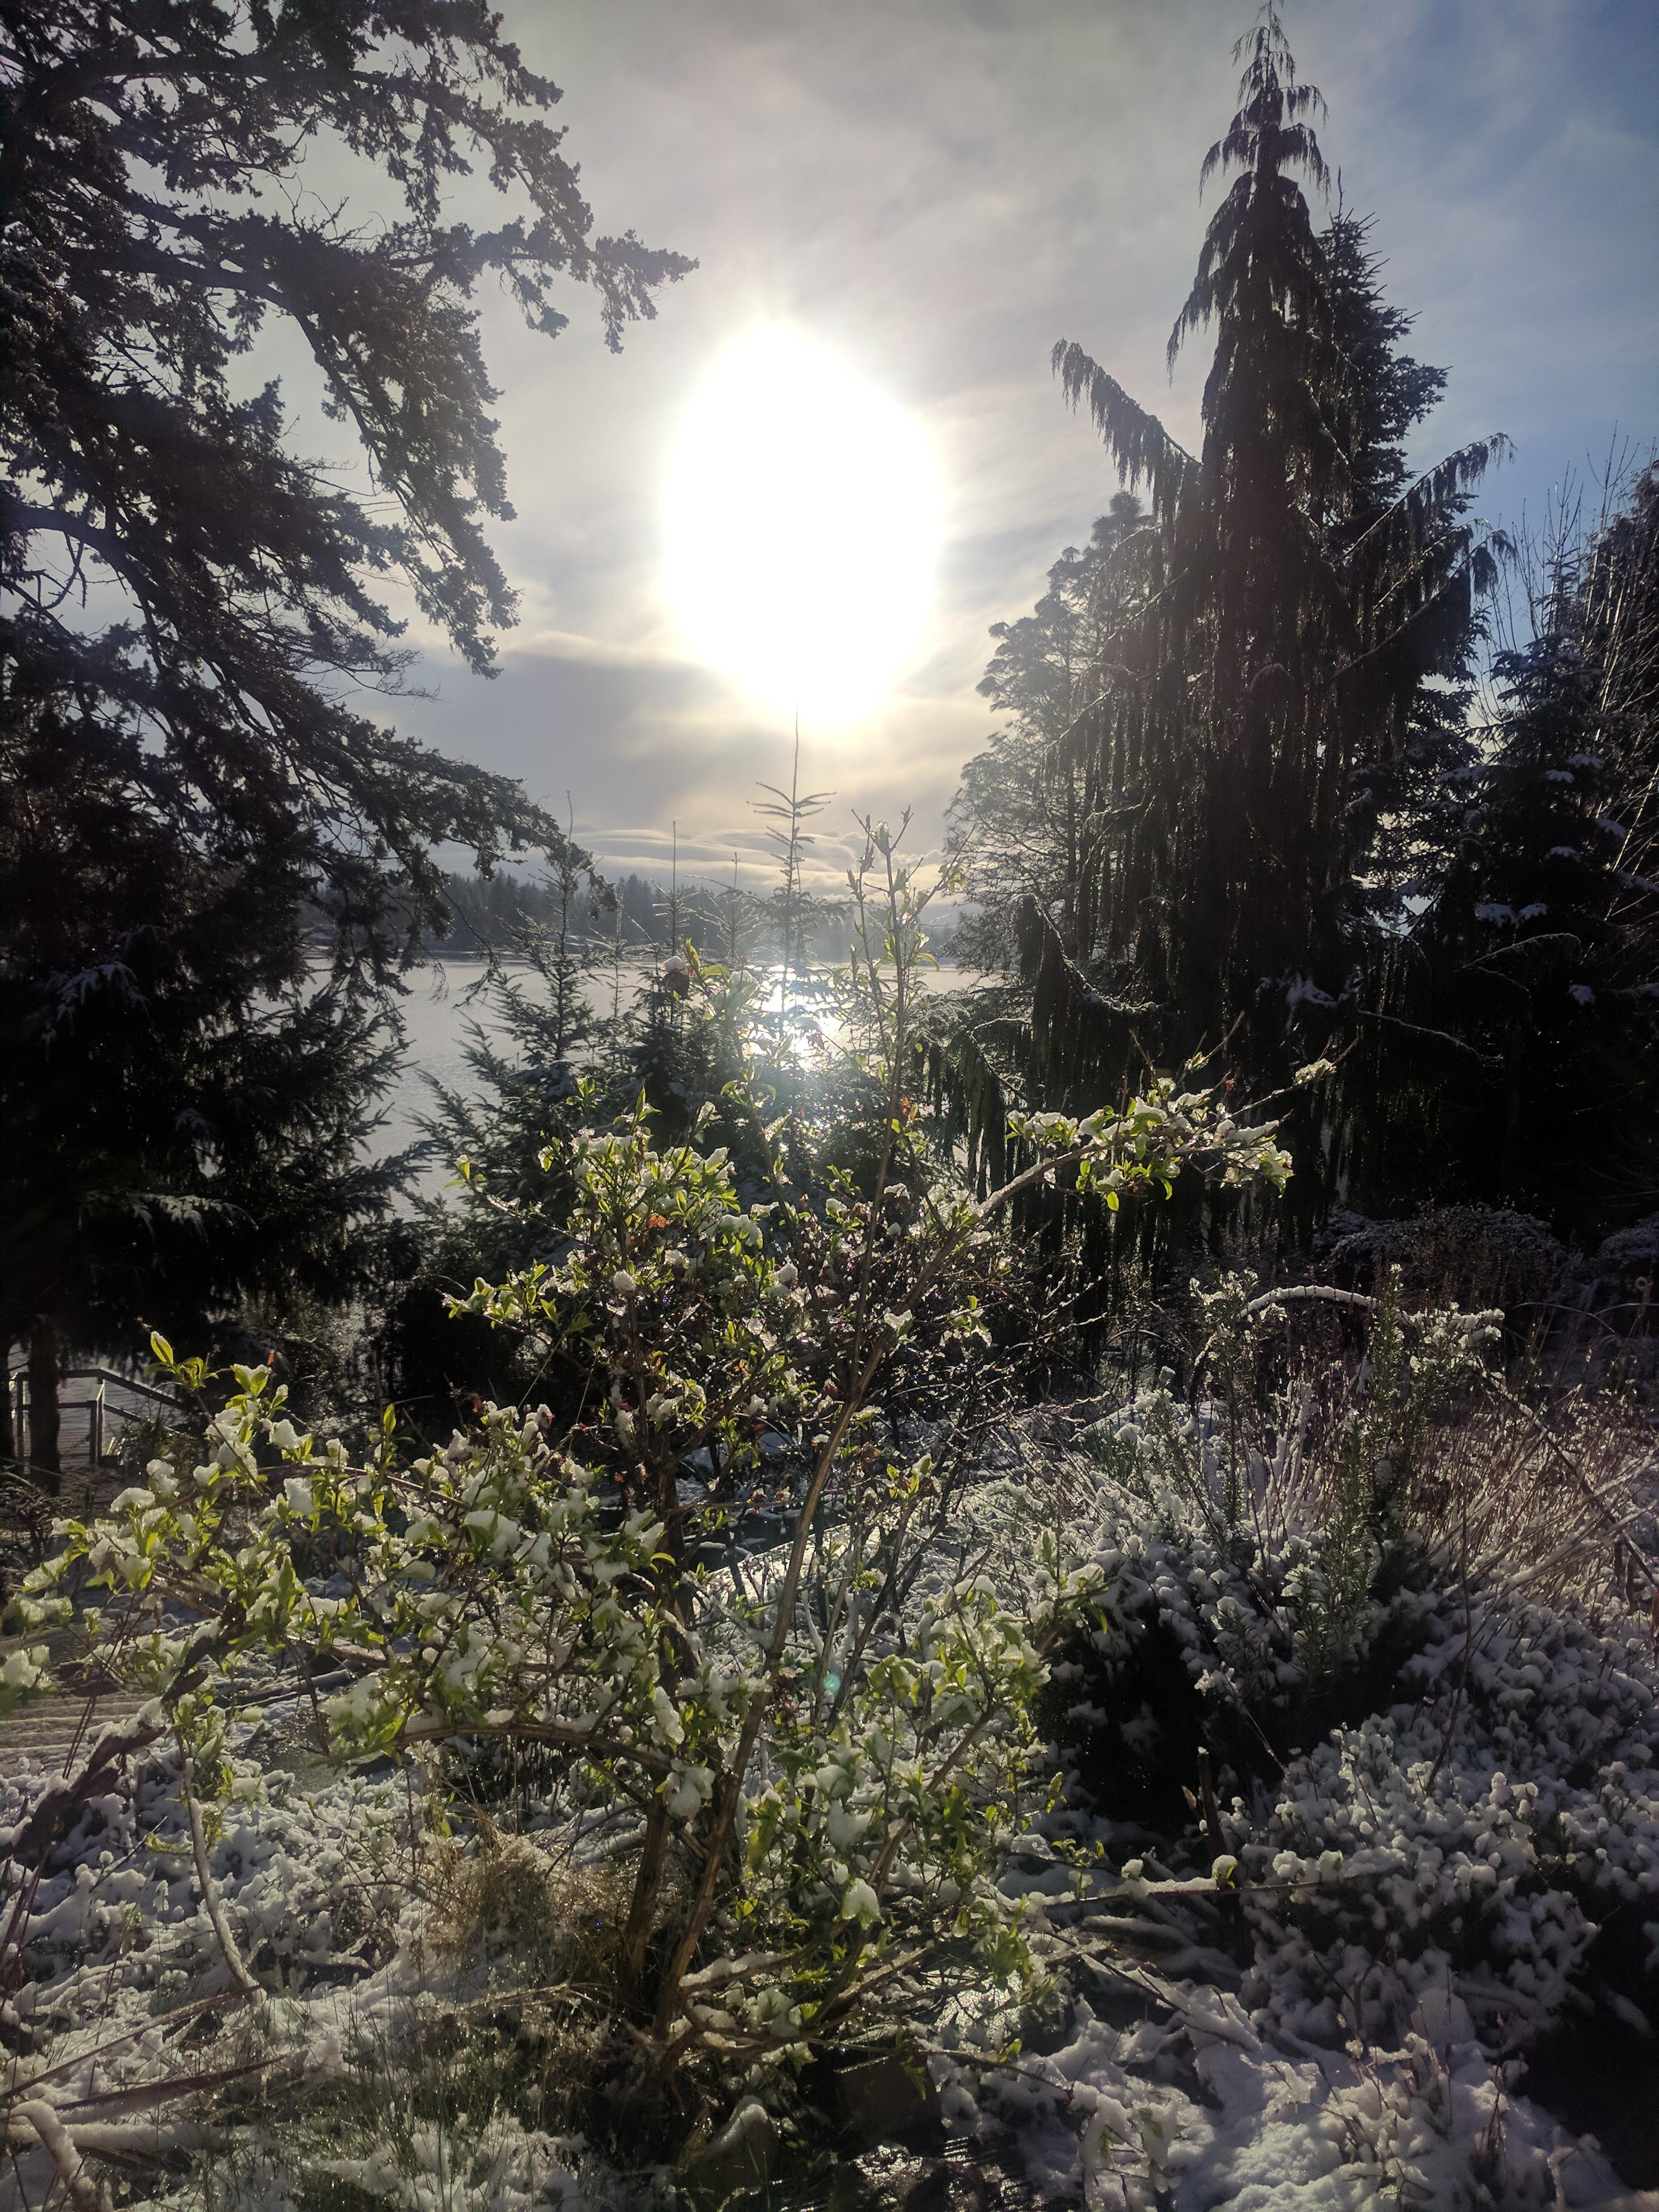 Woke up to snow.